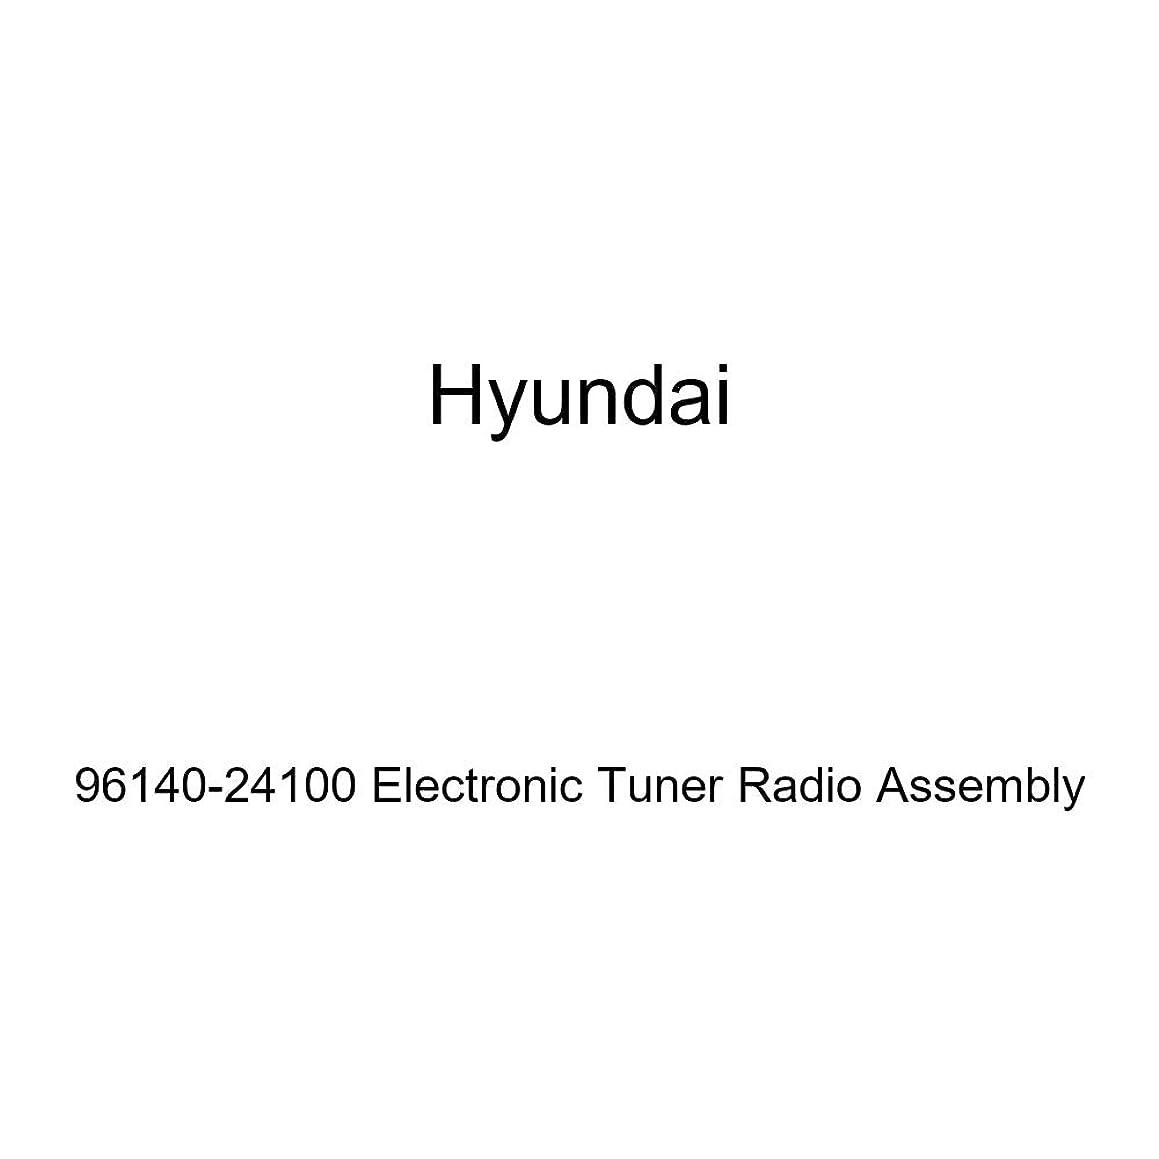 HYUNDAI Genuine 96140-24100 Electronic Tuner Radio Assembly